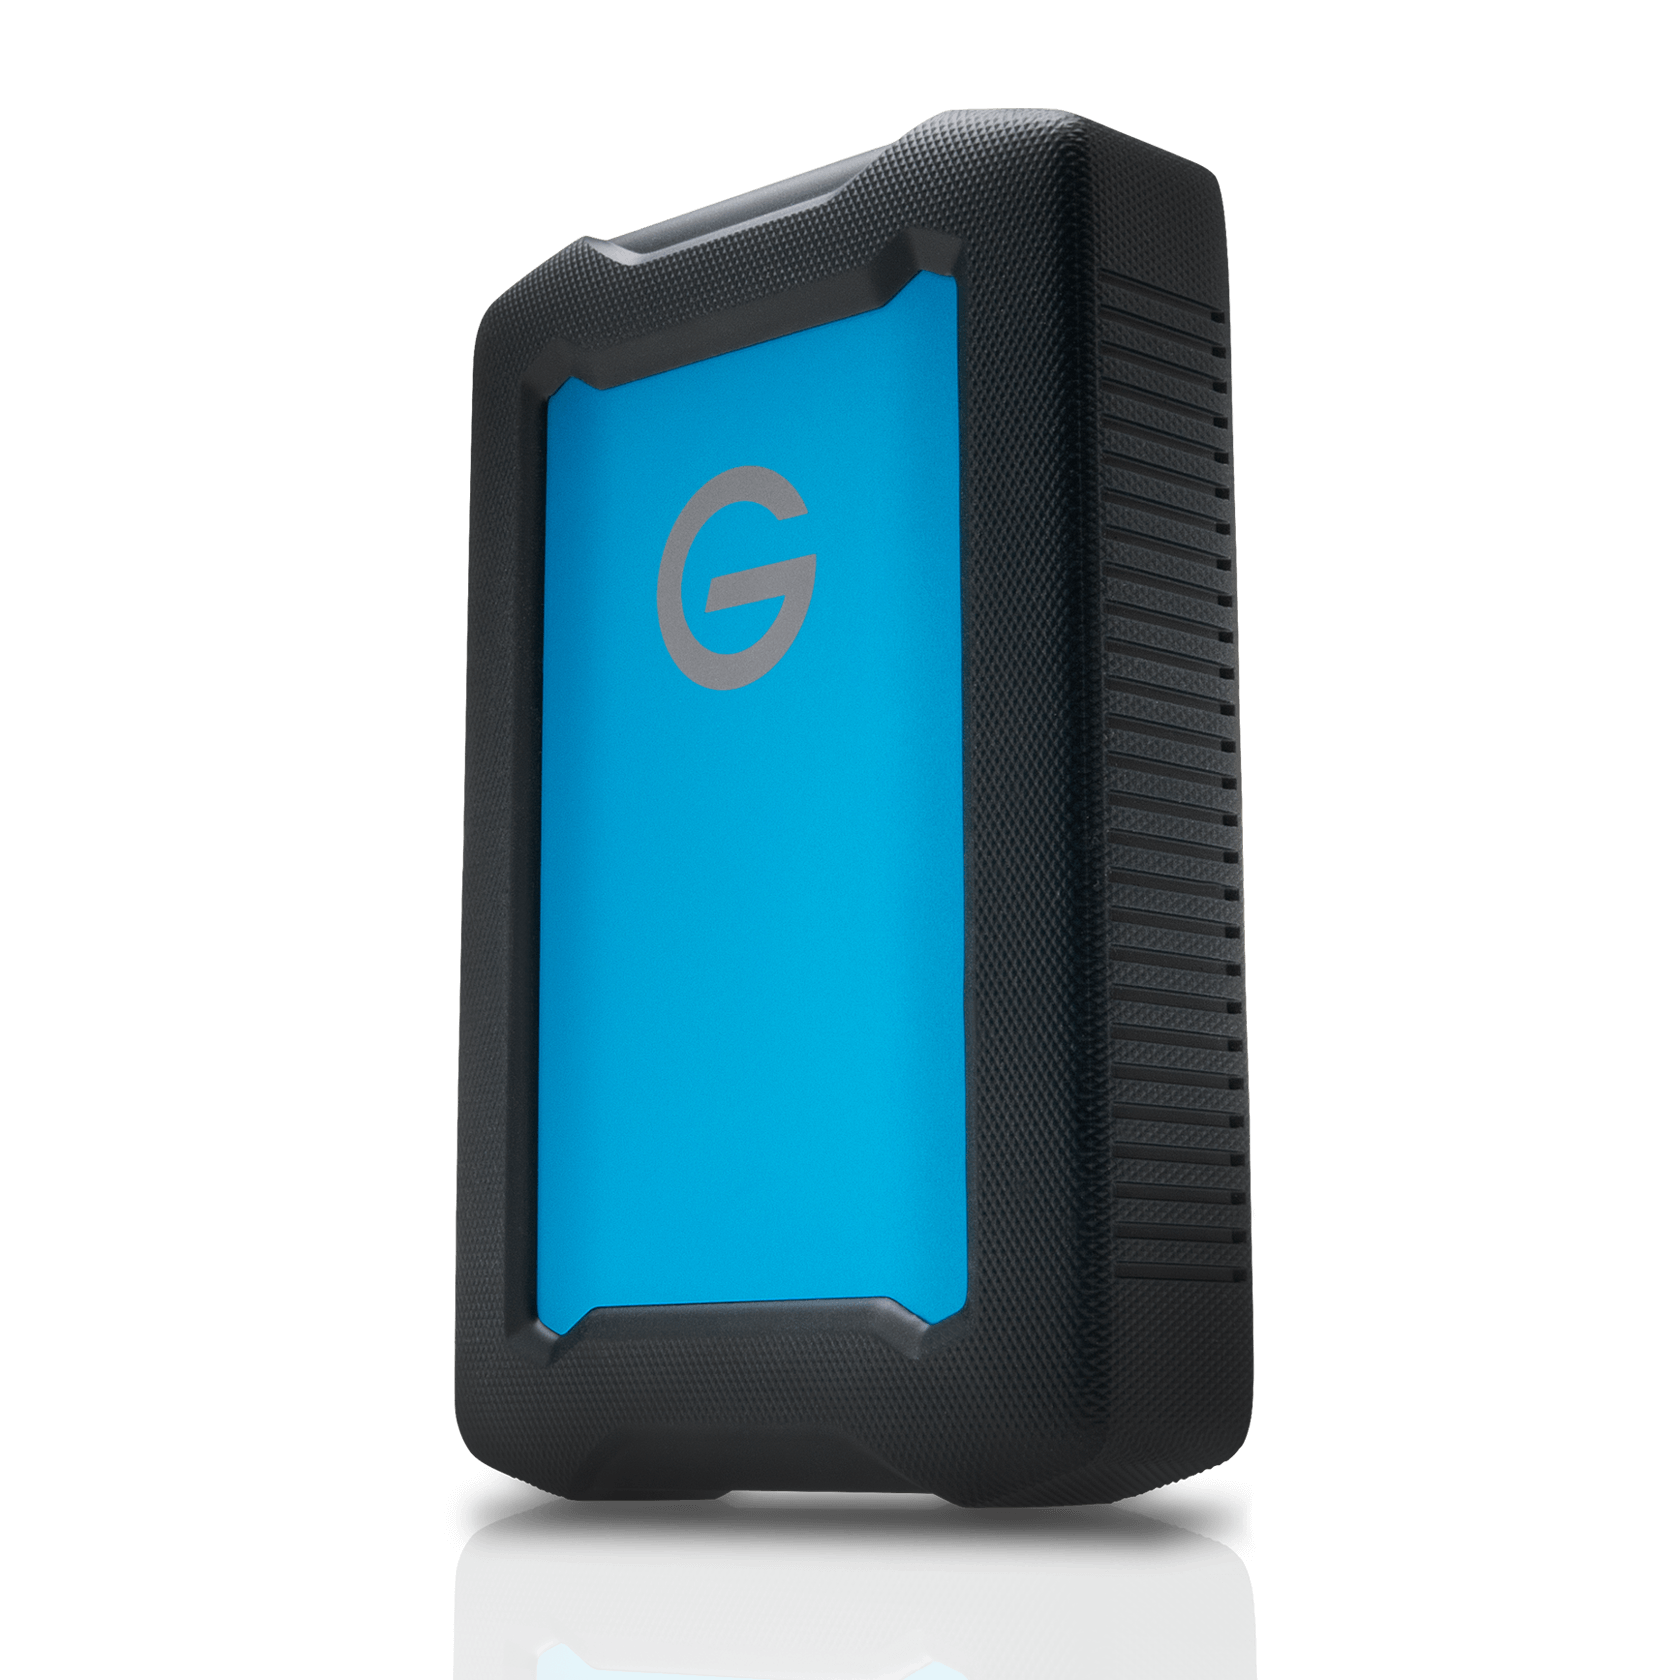 WesternDigital coupon: G-Technology 4TB ArmorATD - 0G10435-1